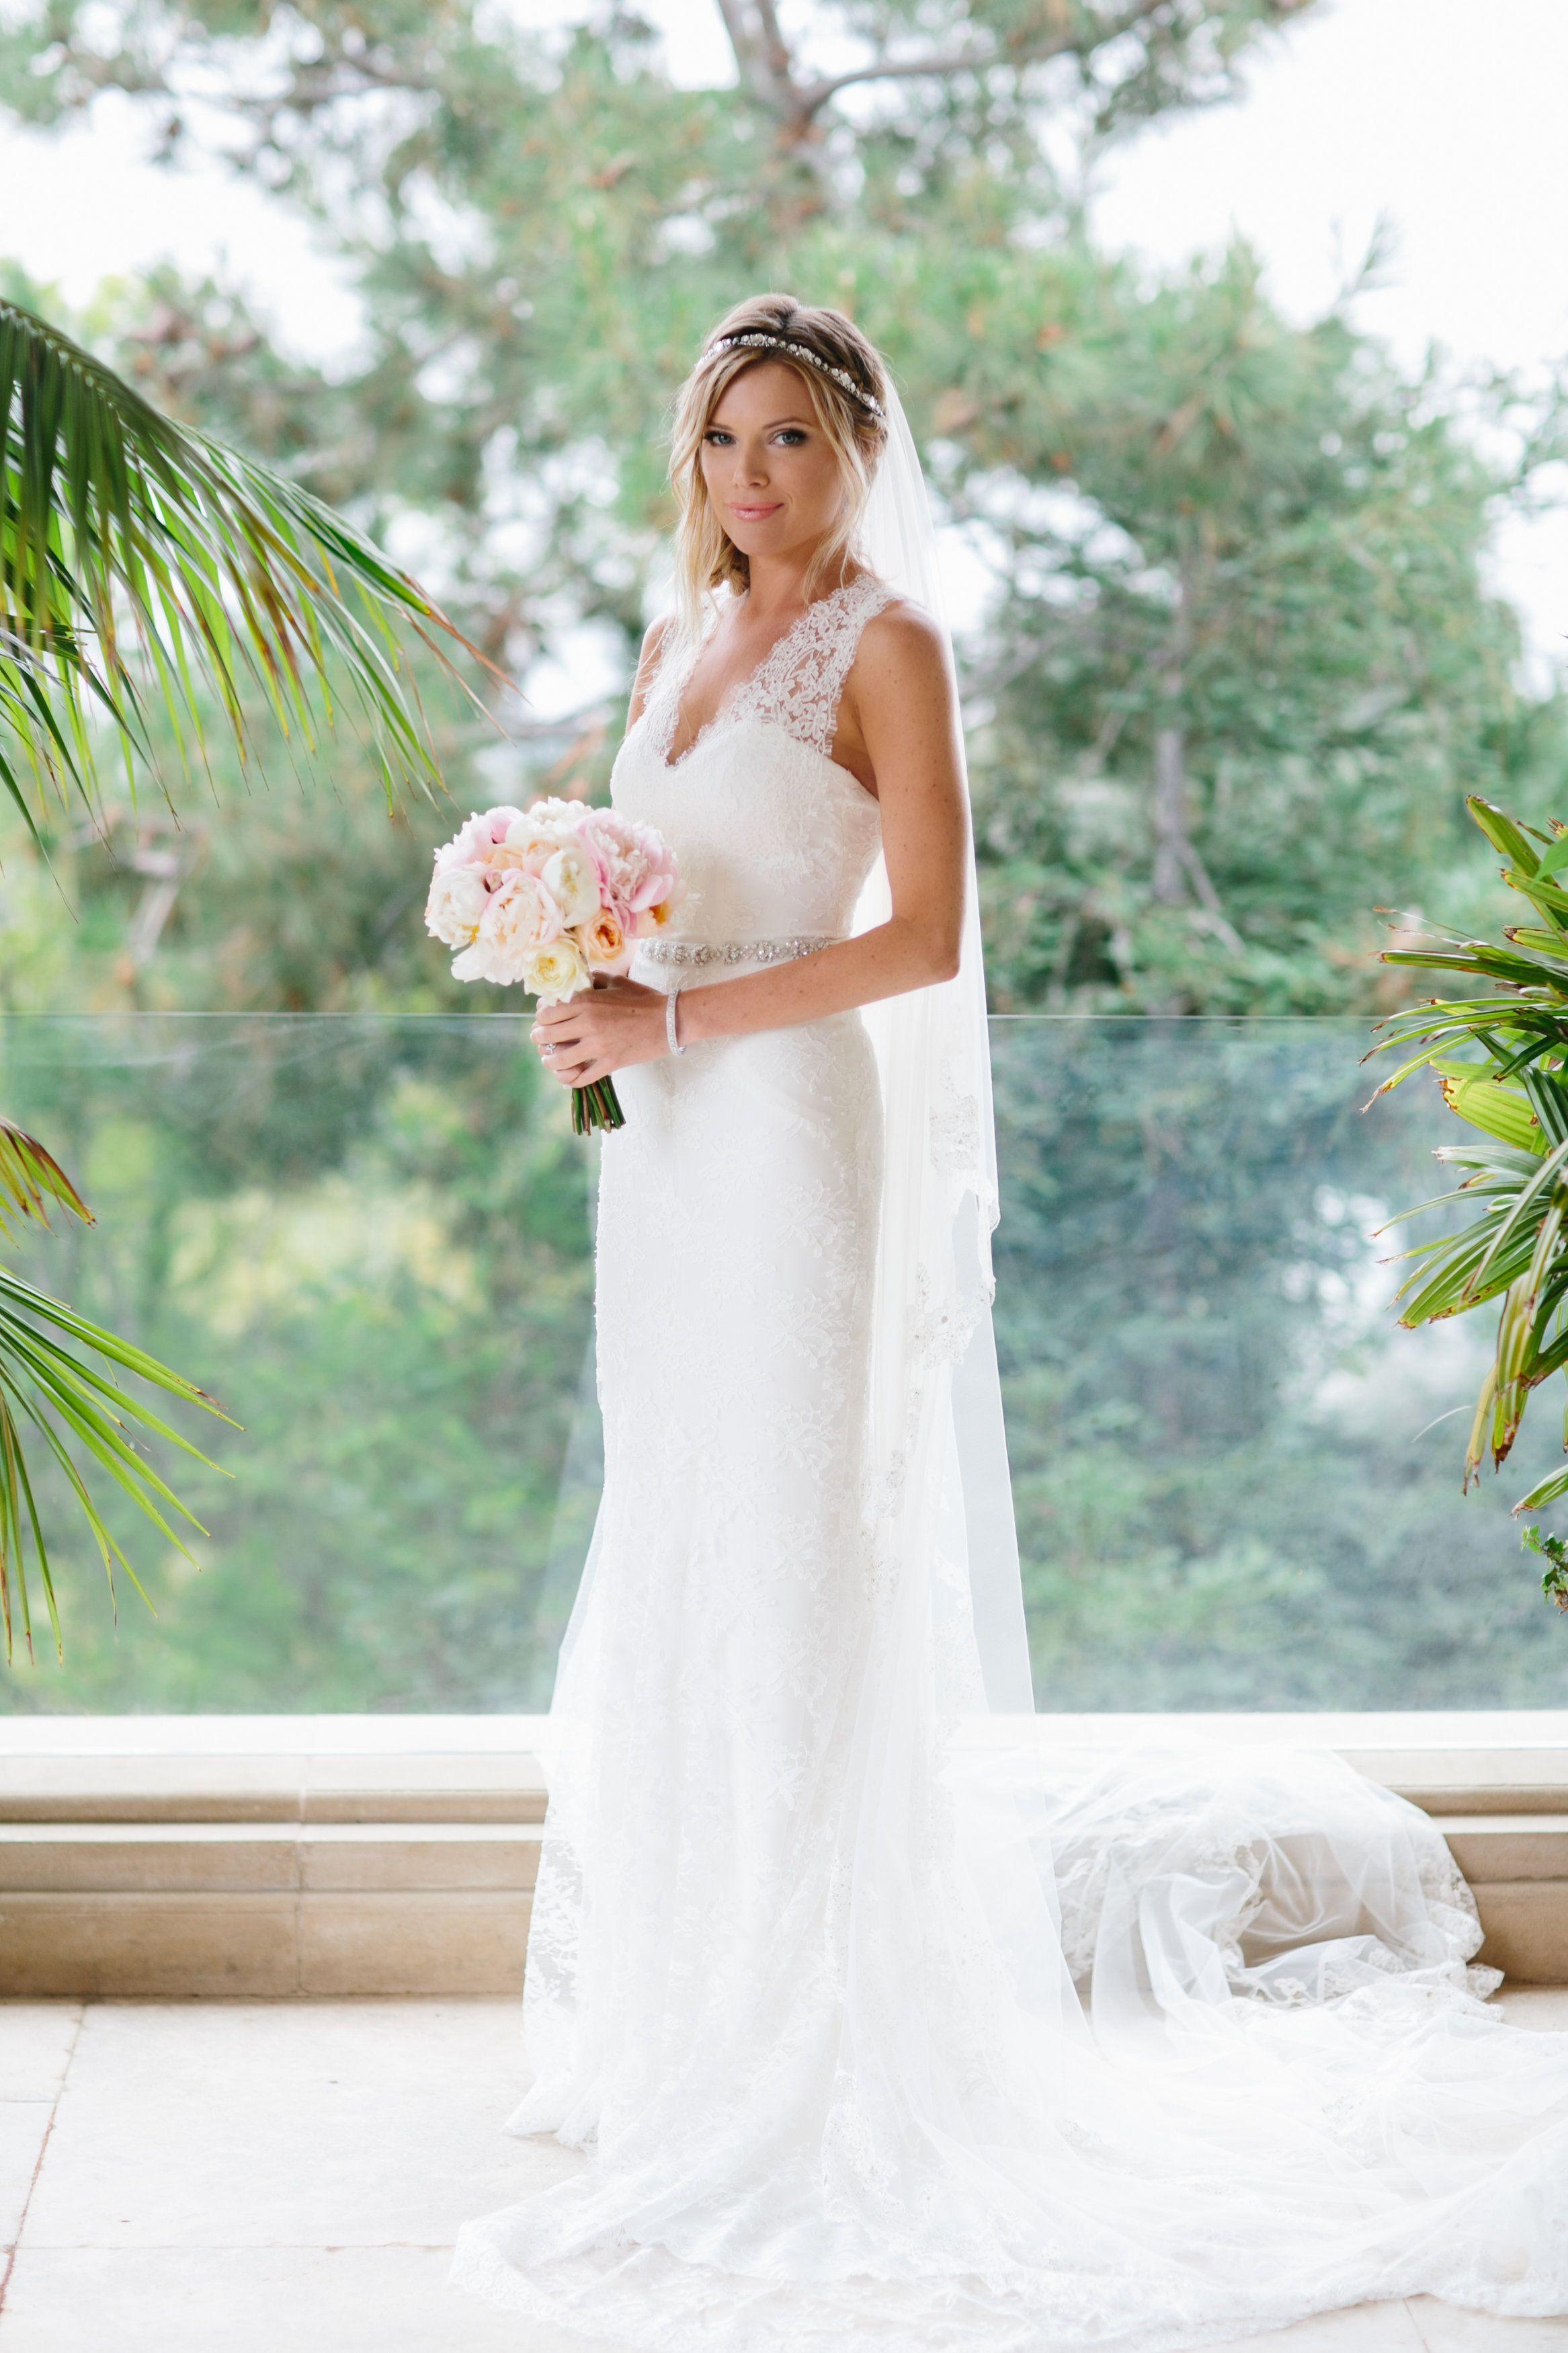 Jordan Foster wearing Monique Lhuillier on her wedding day. Heather ...